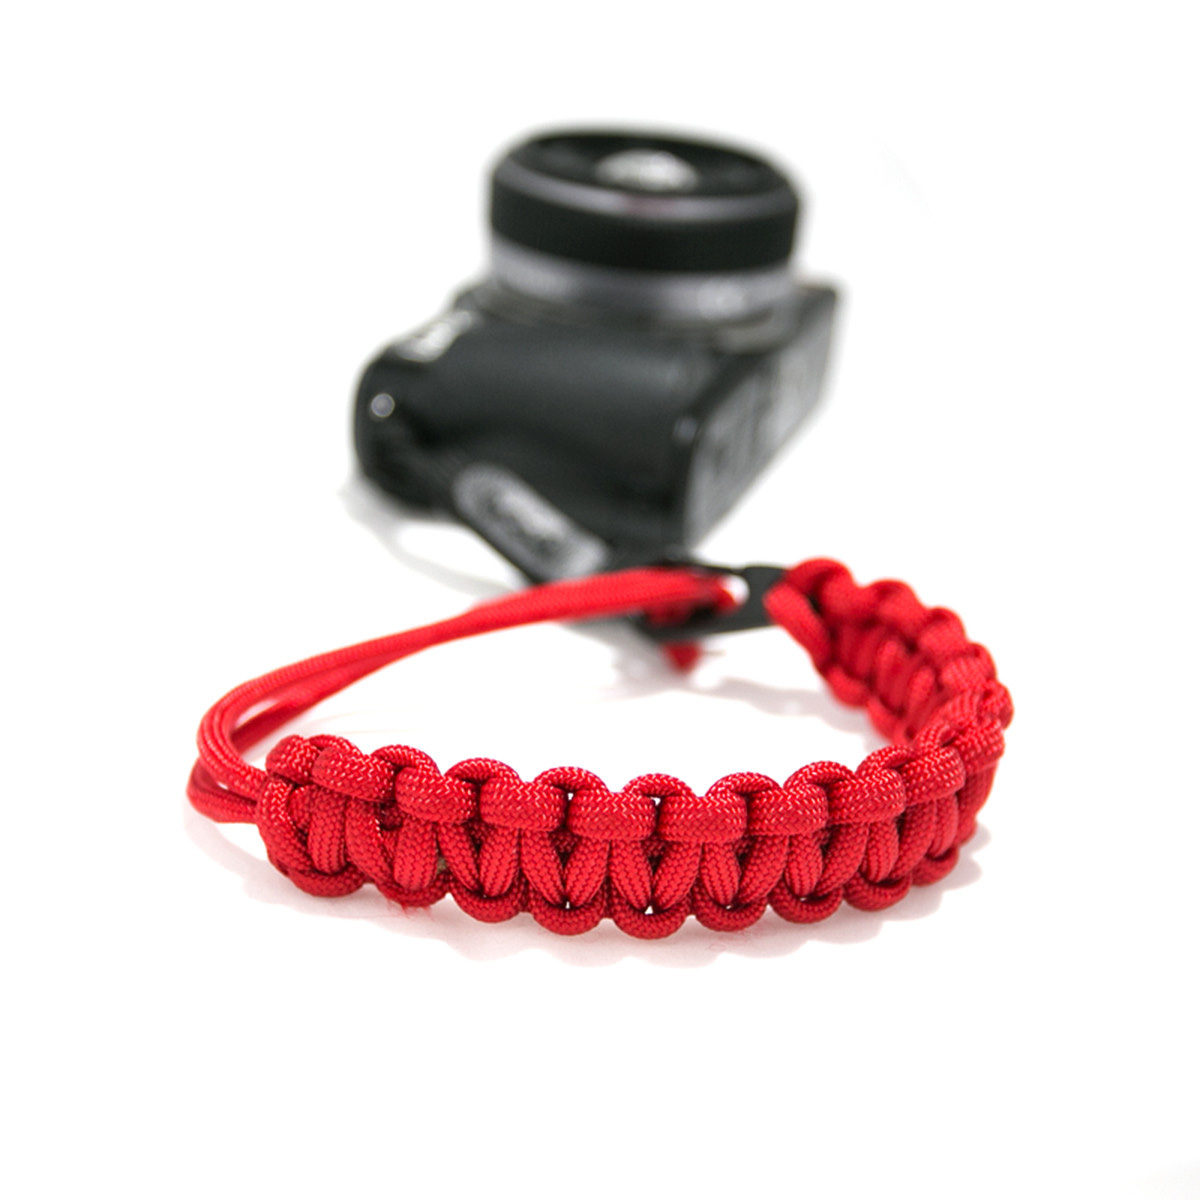 DSPTCH Camera Wrist Strap - Red/Matte Black